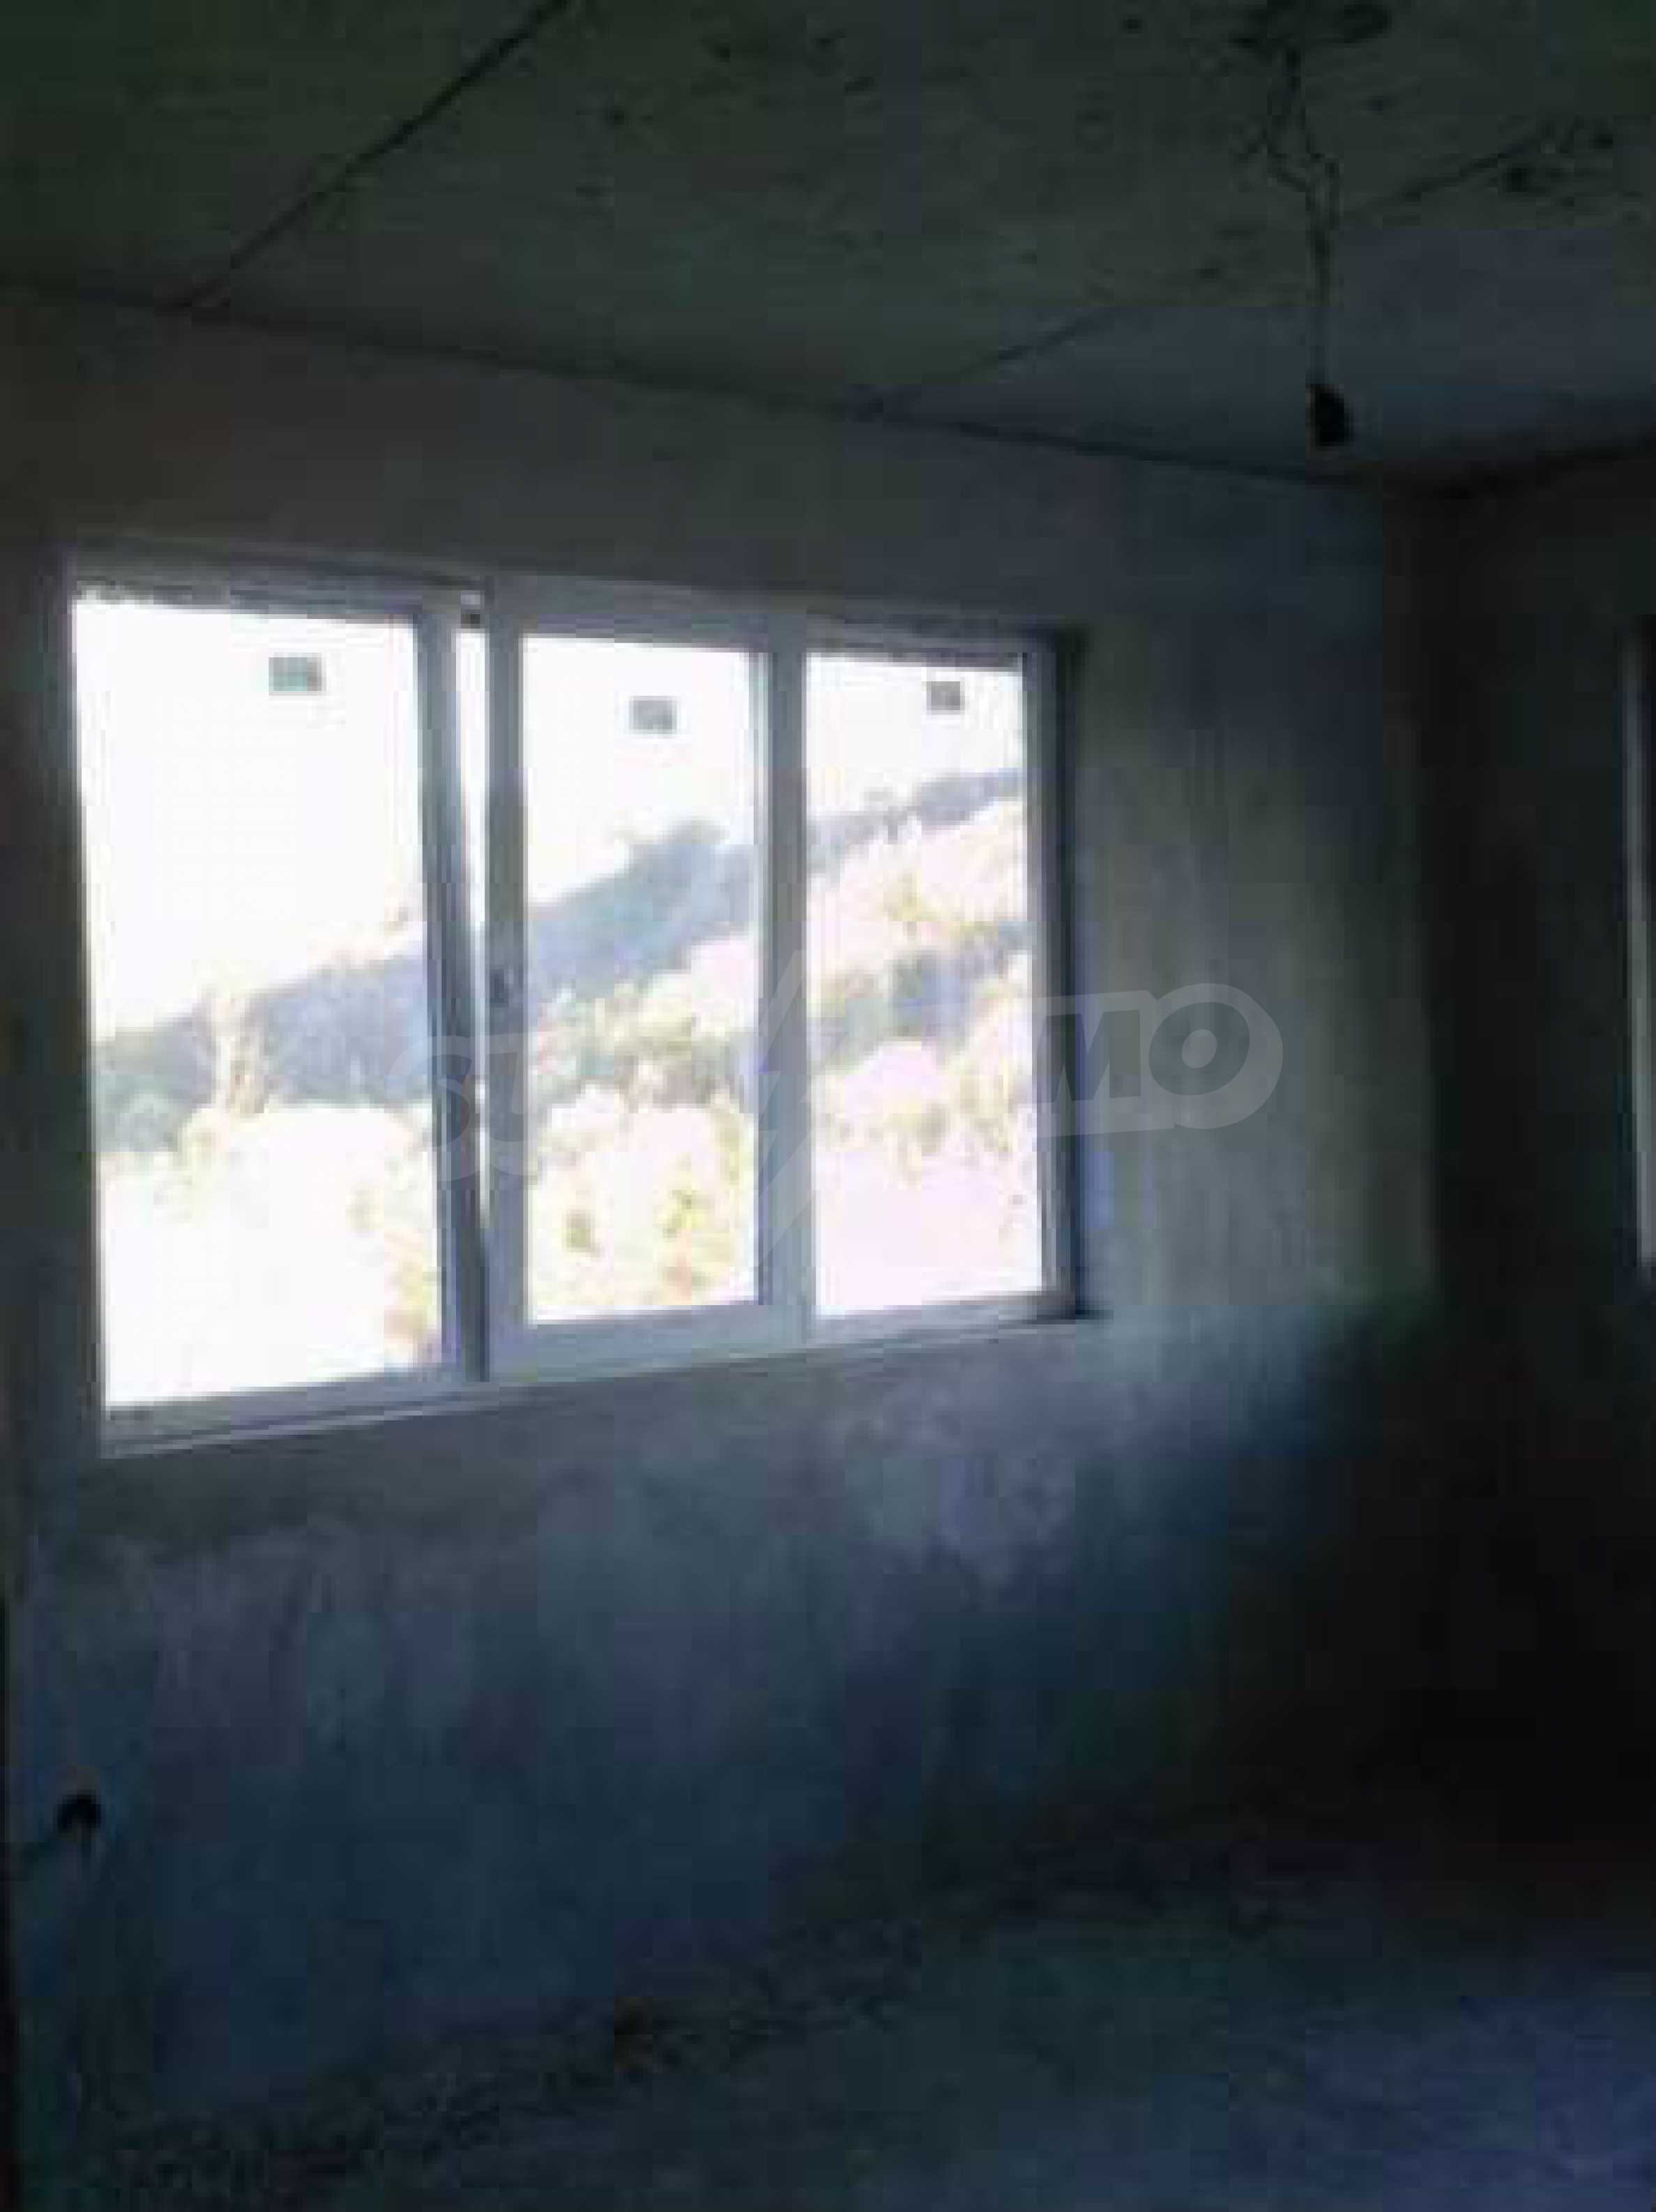 Новопостроена двуетажна къща в квартал на град Габрово 2